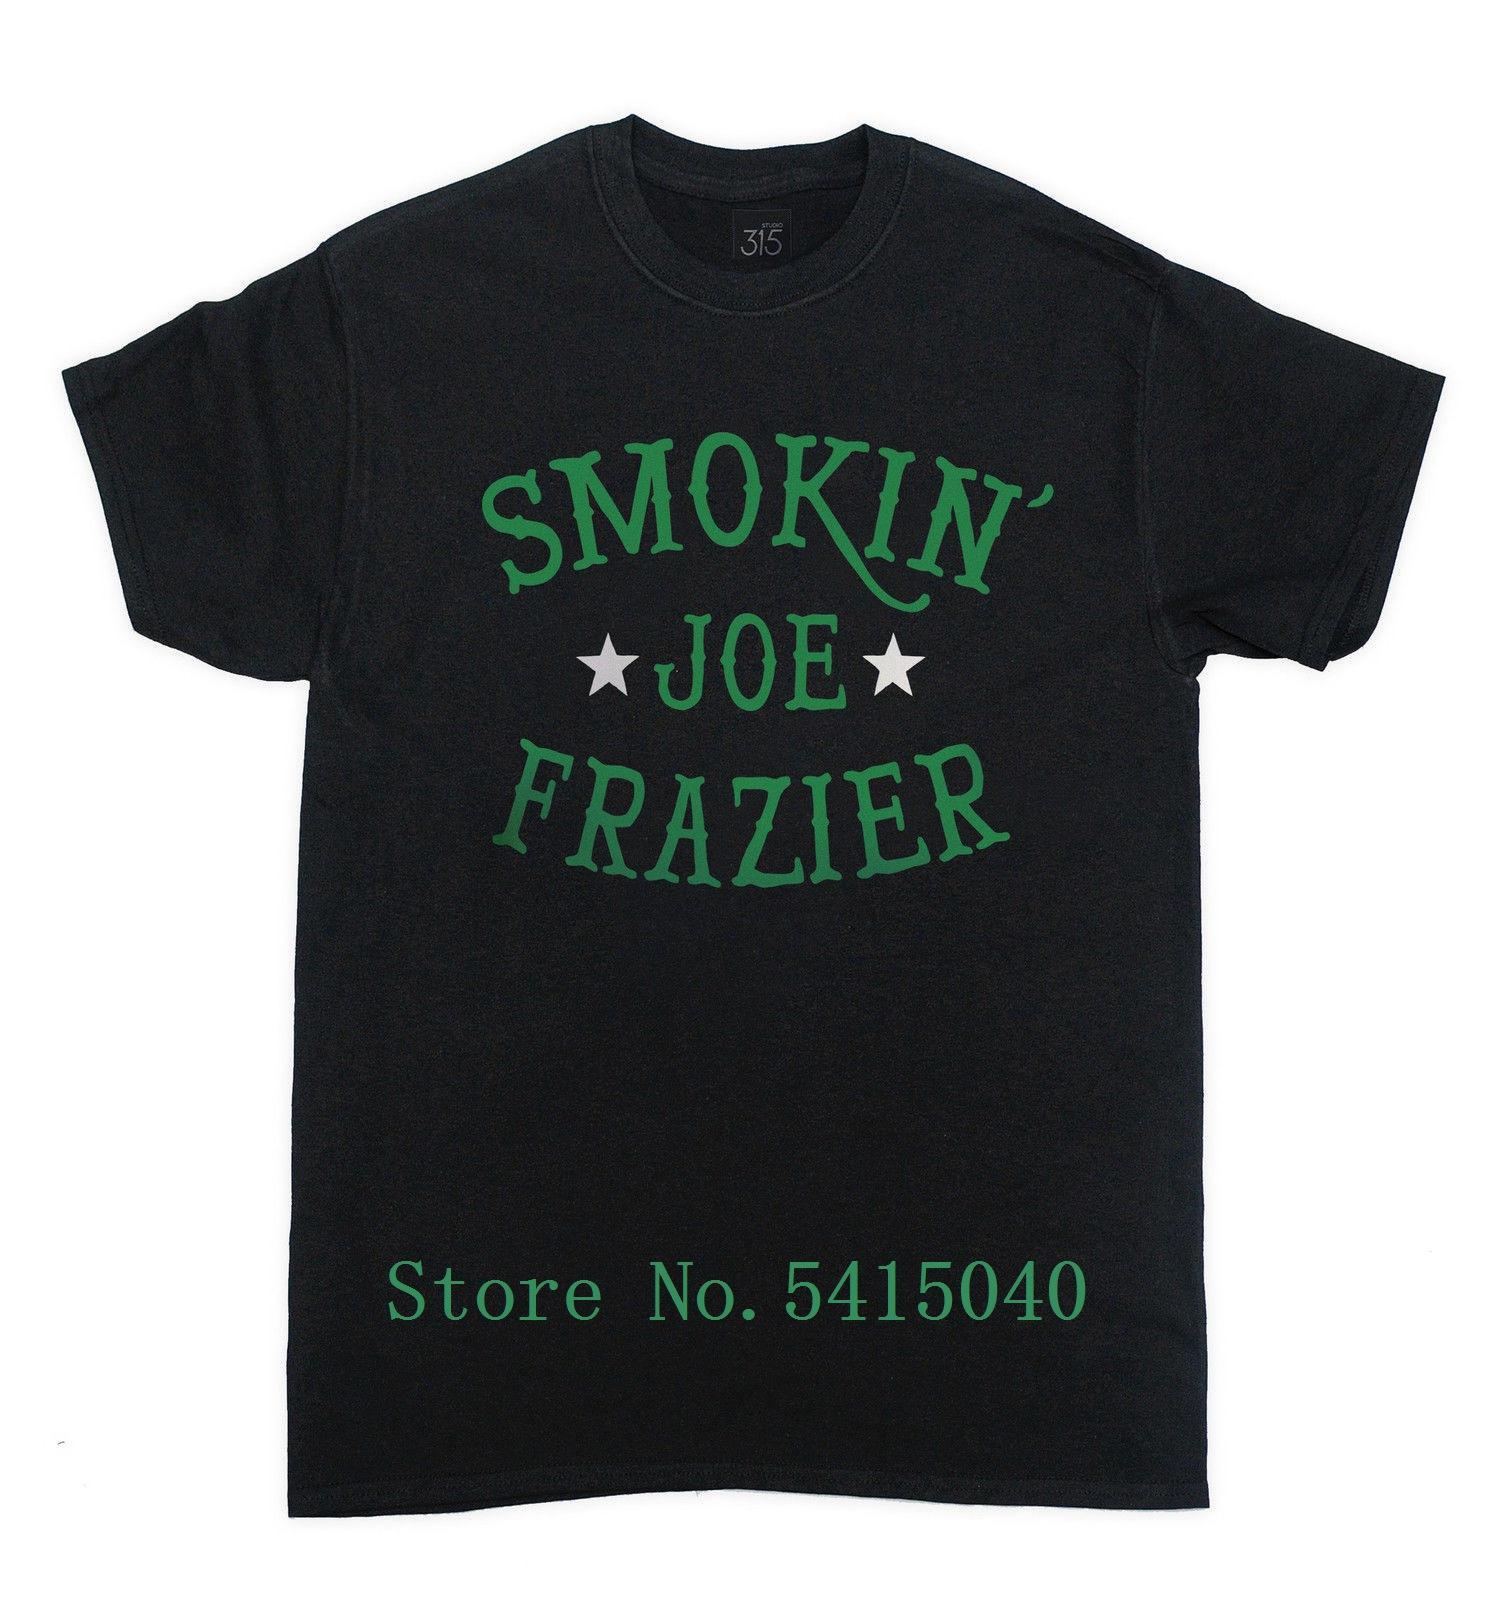 Smokin' Joe Frazier Tişört - Moda Boks Ağır Siklet Legend Retro Tee Vintage Pride Tişörtlü Erkek Unisex Tshirt Soğuk